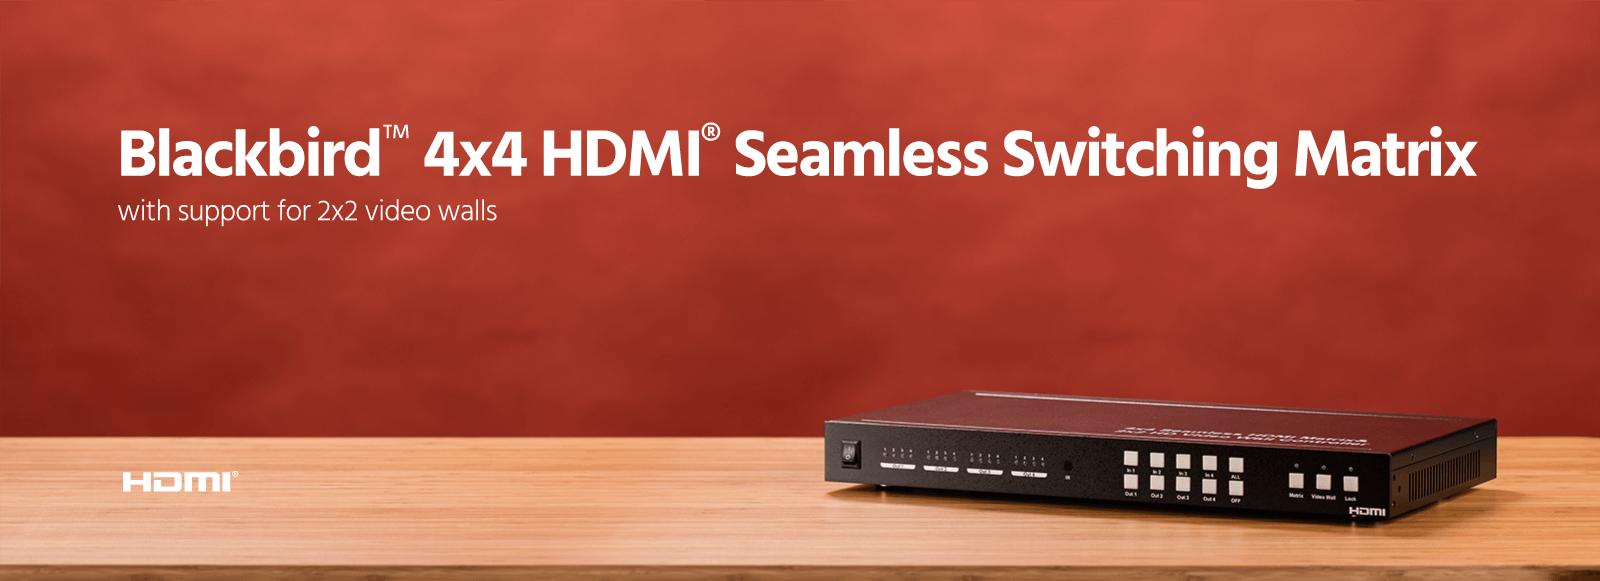 Blackbird 4x4 HDMI Seamless Switching Matrix